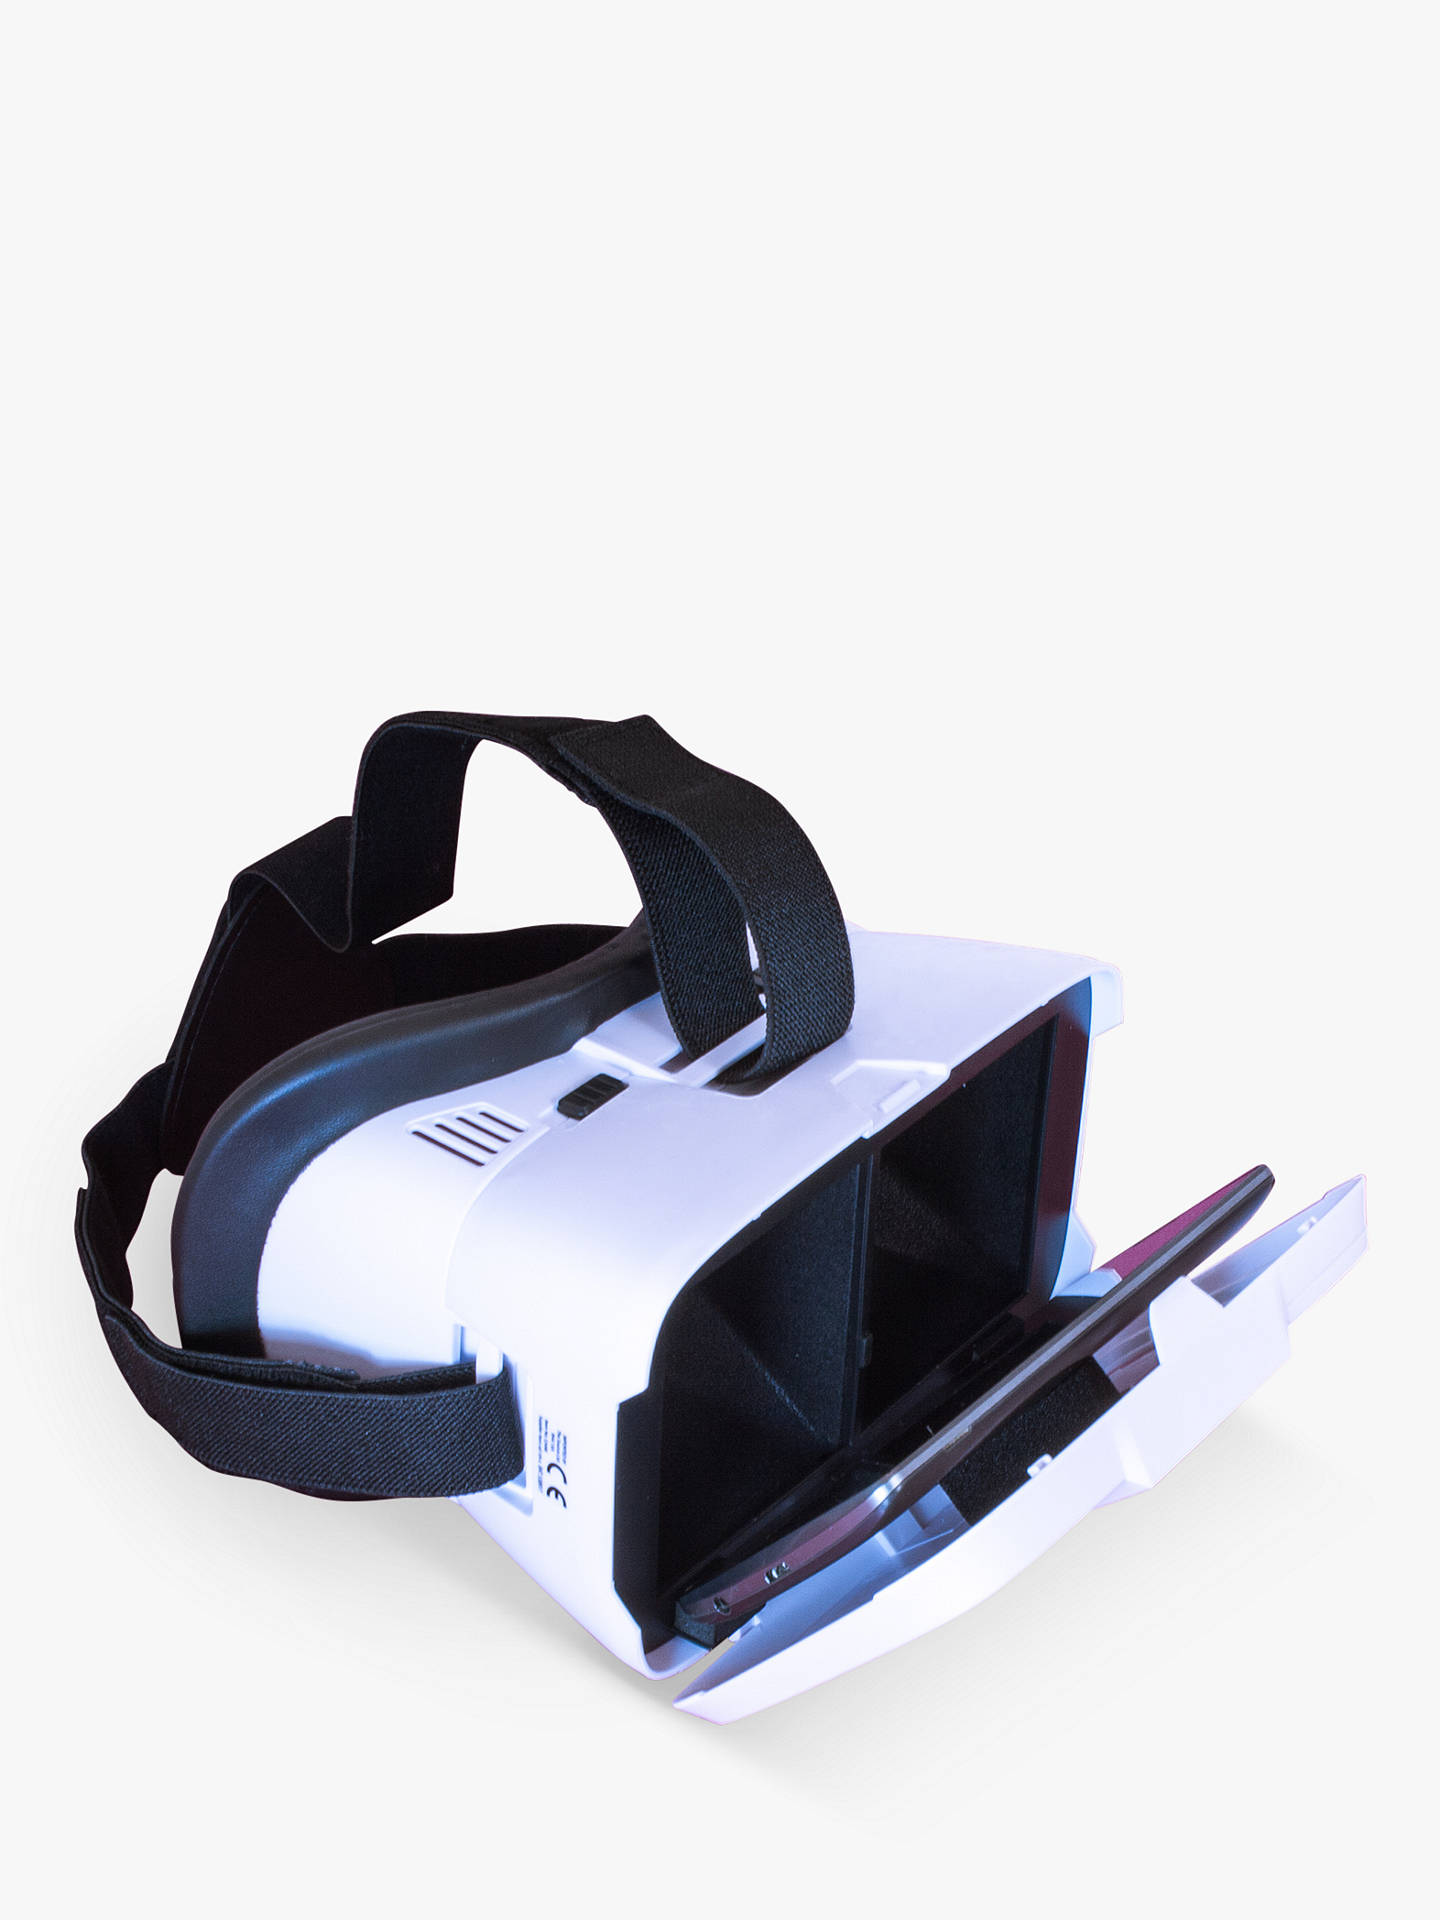 RED5 Vizor Pro Virtual Reality Headset at John Lewis & Partners